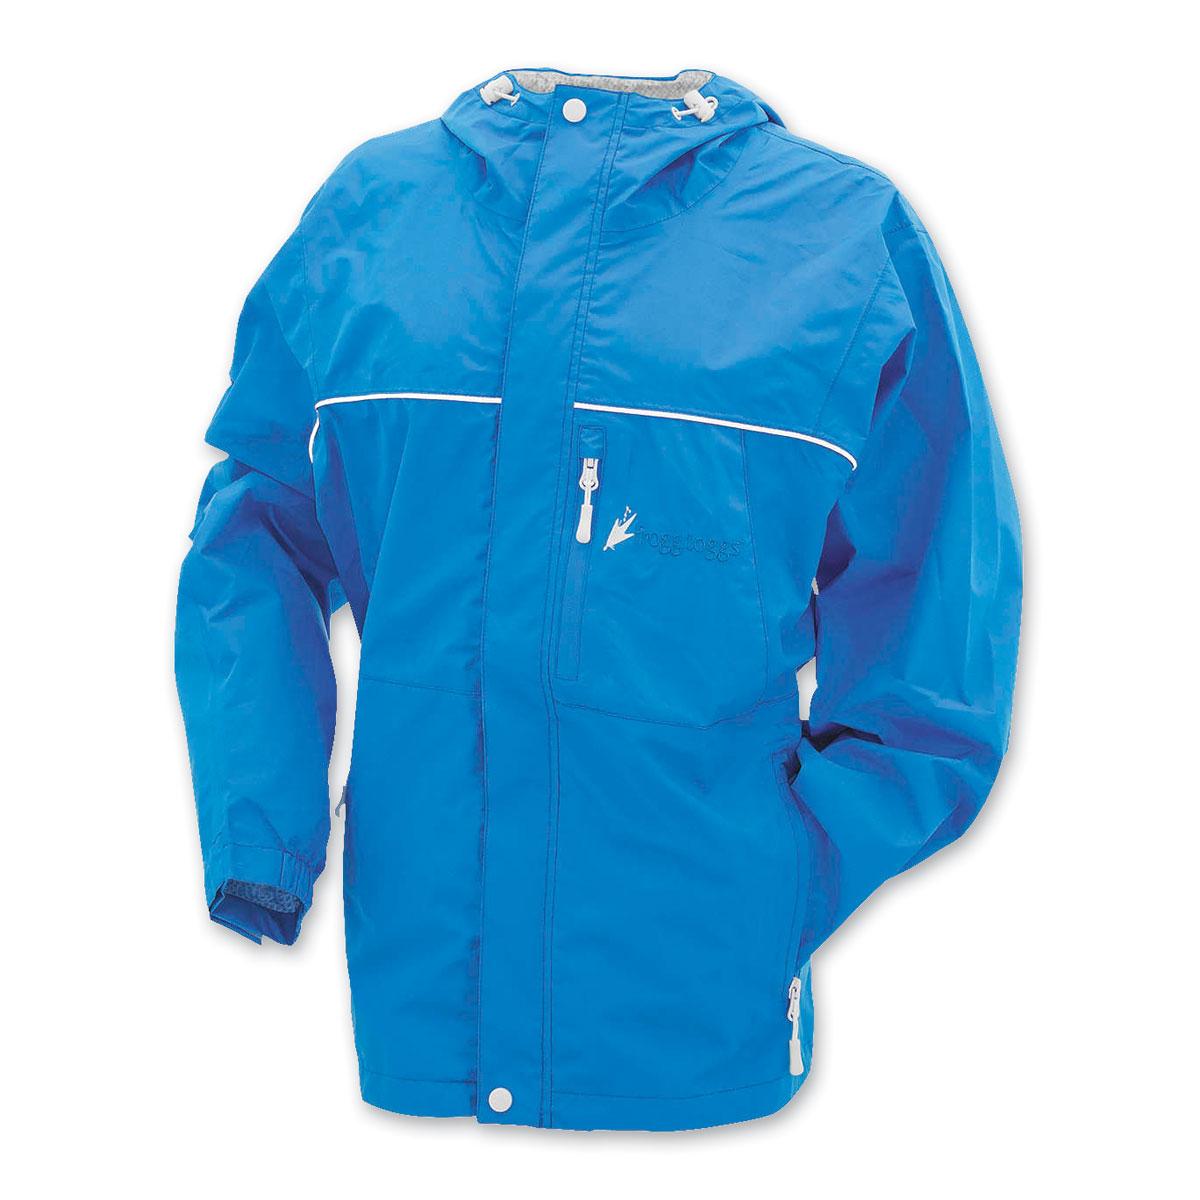 Frogg Toggs Women's Java Toadz Blue Rain Jacket